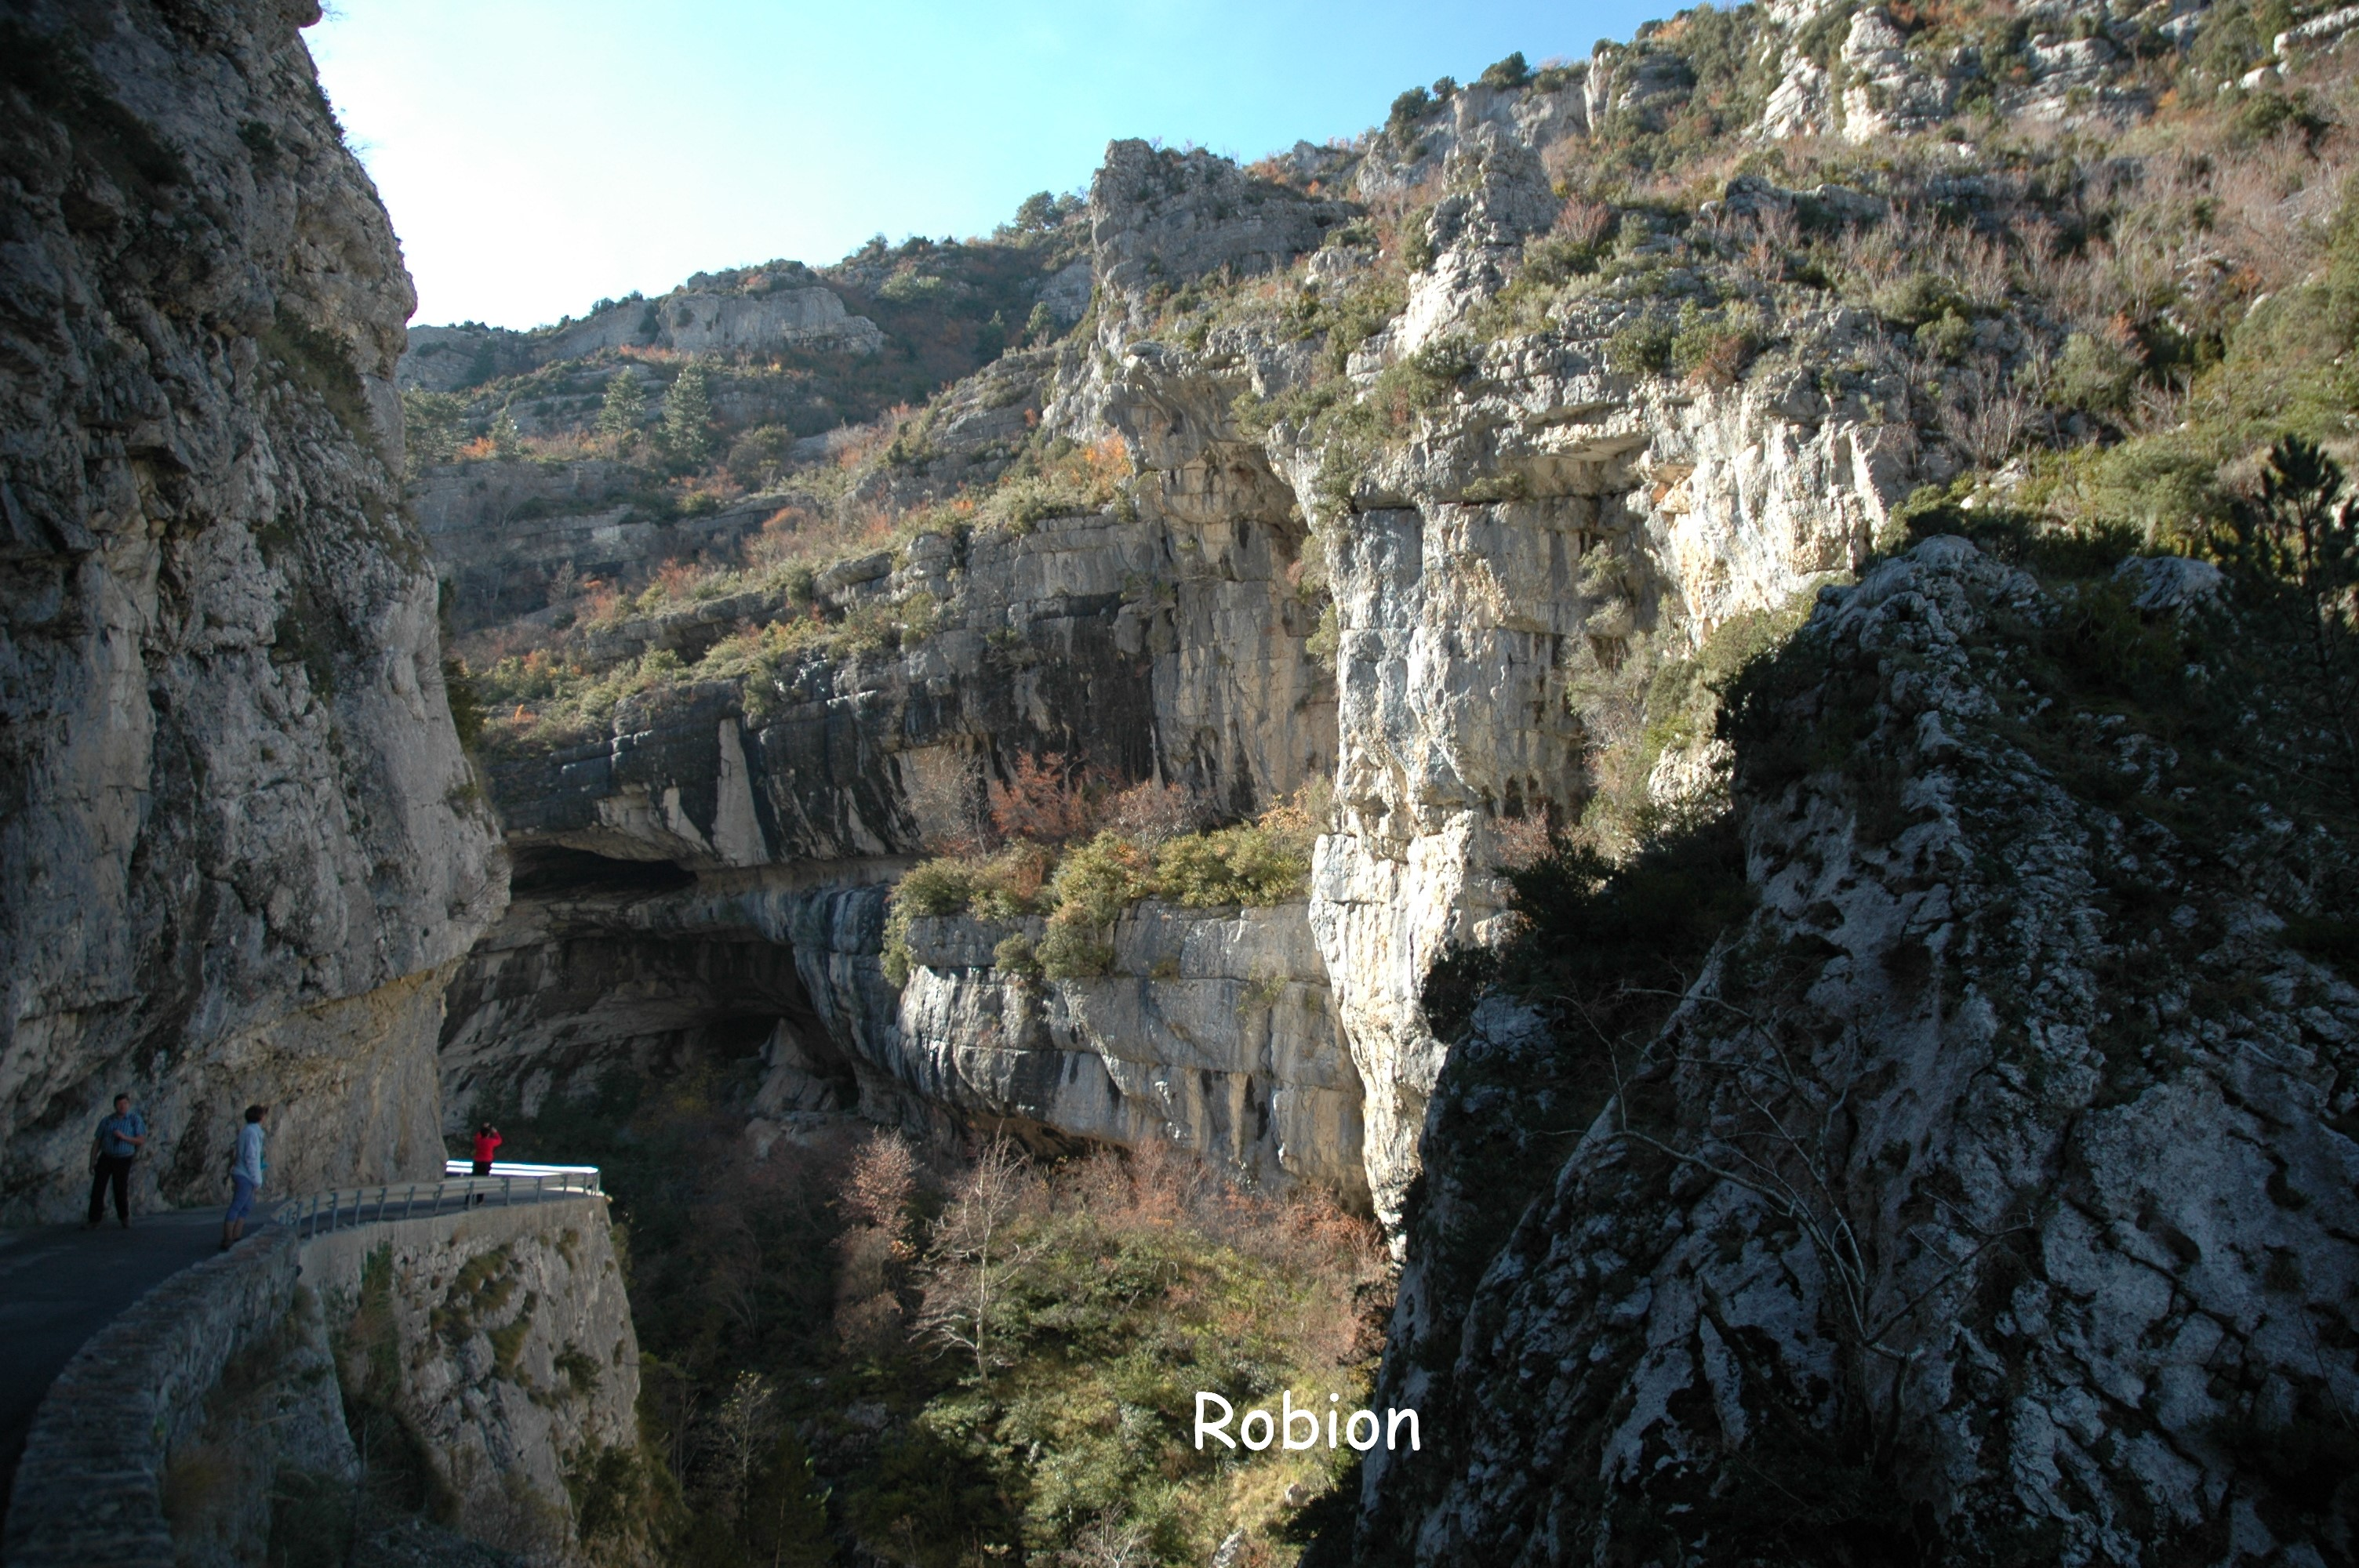 1-Robion